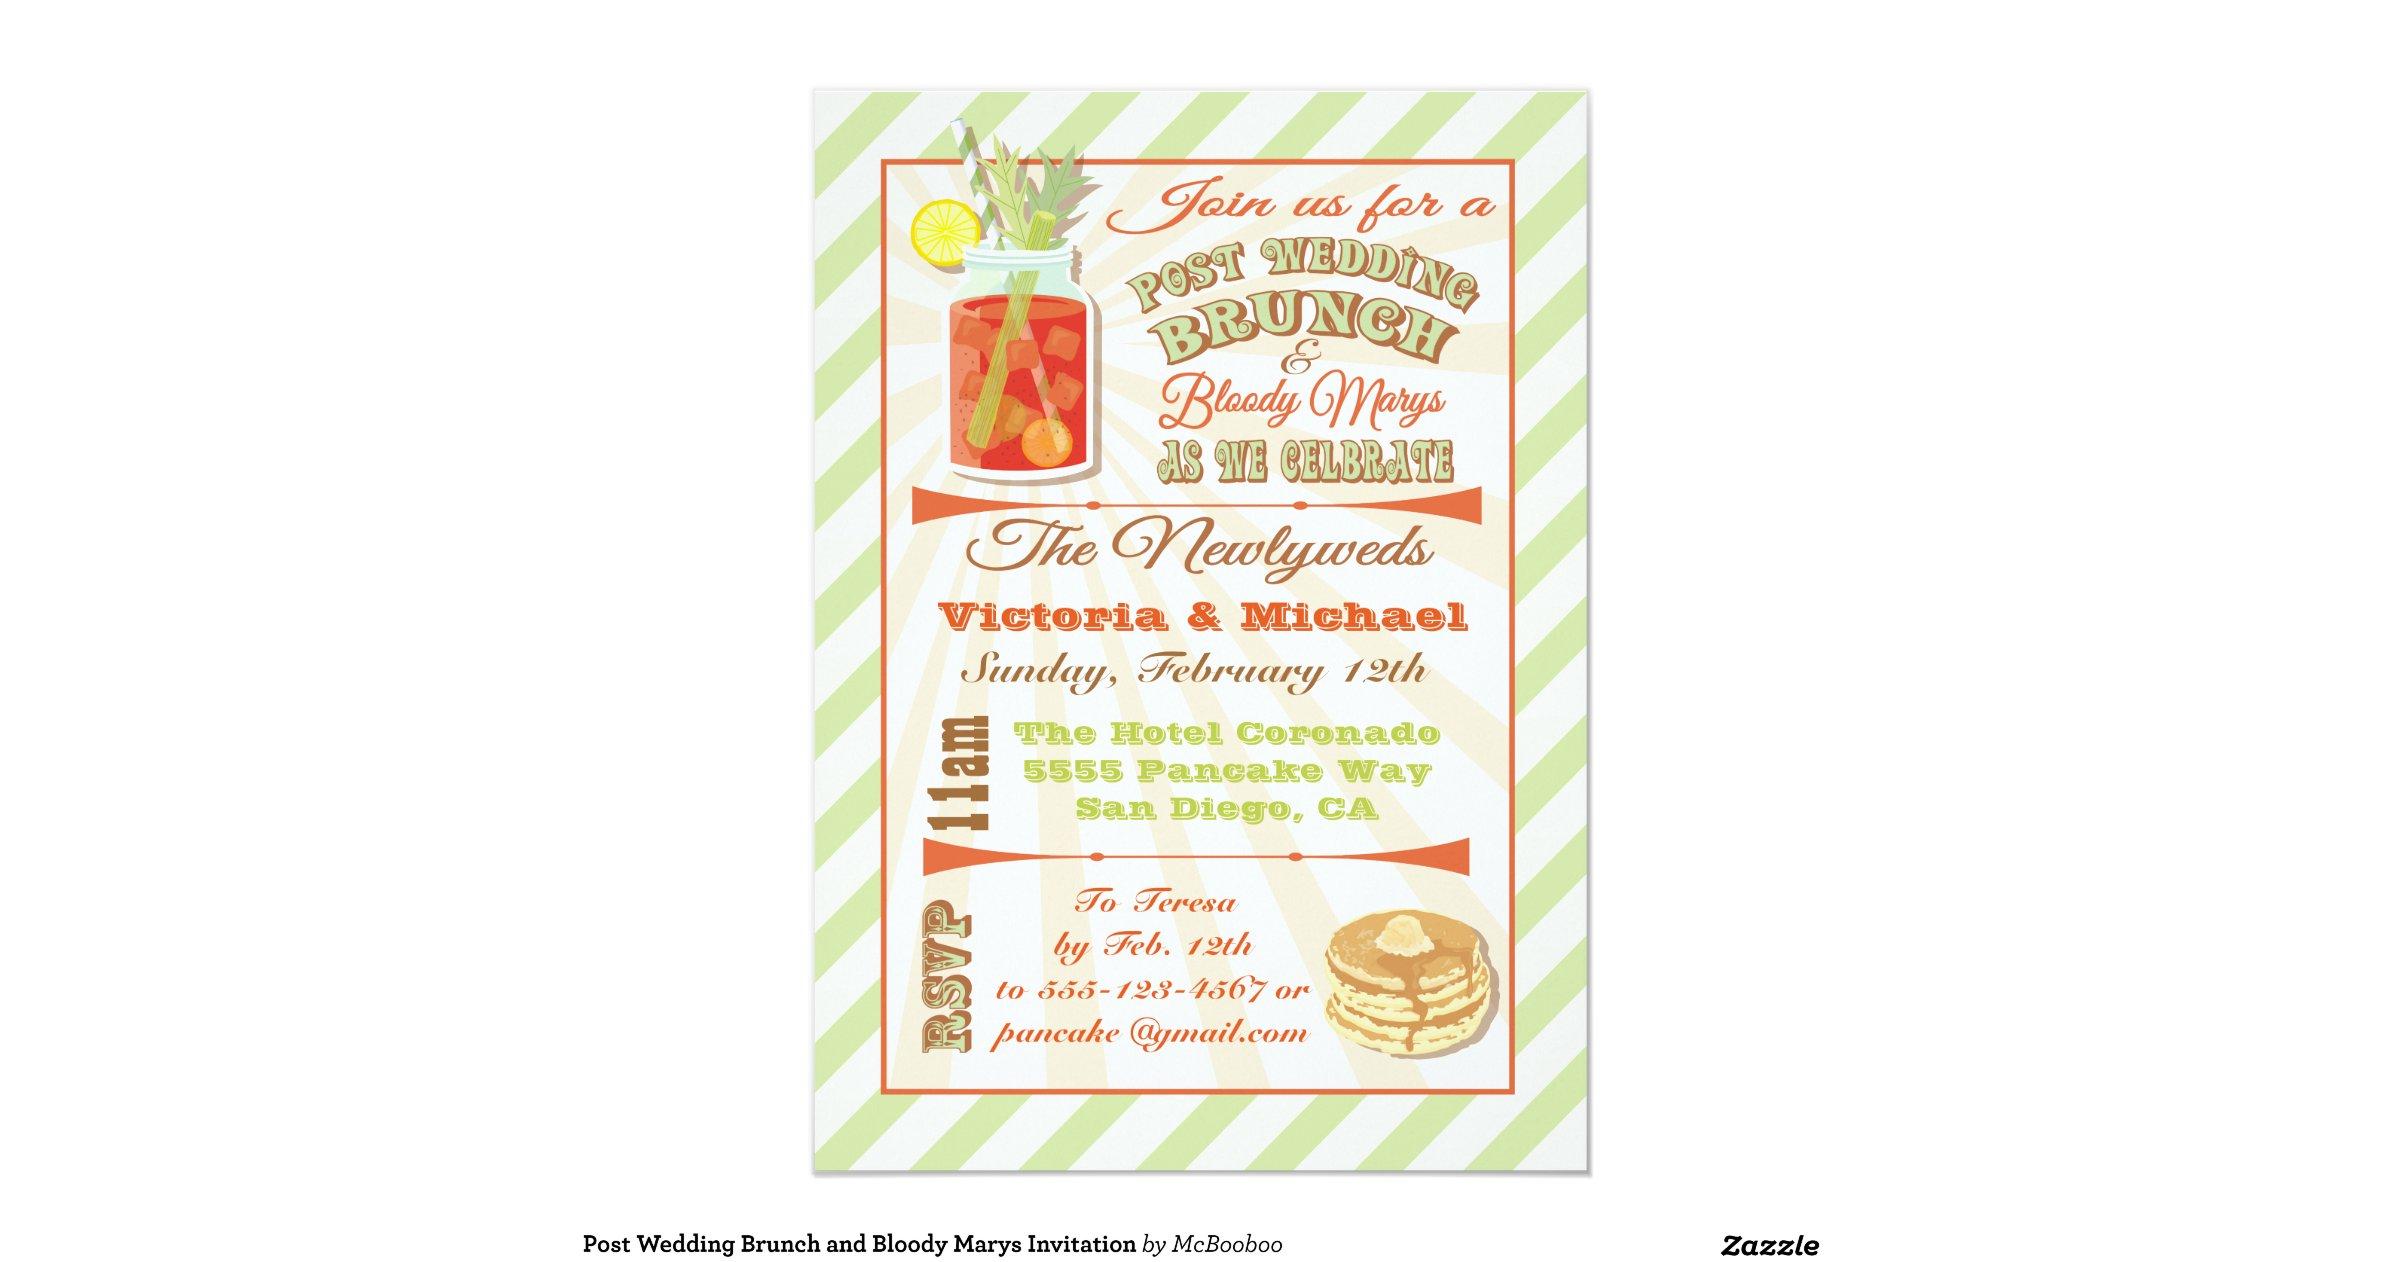 Post Wedding Brunch Invitation Wording: Post_wedding_brunch_and_bloody_marys_invitation